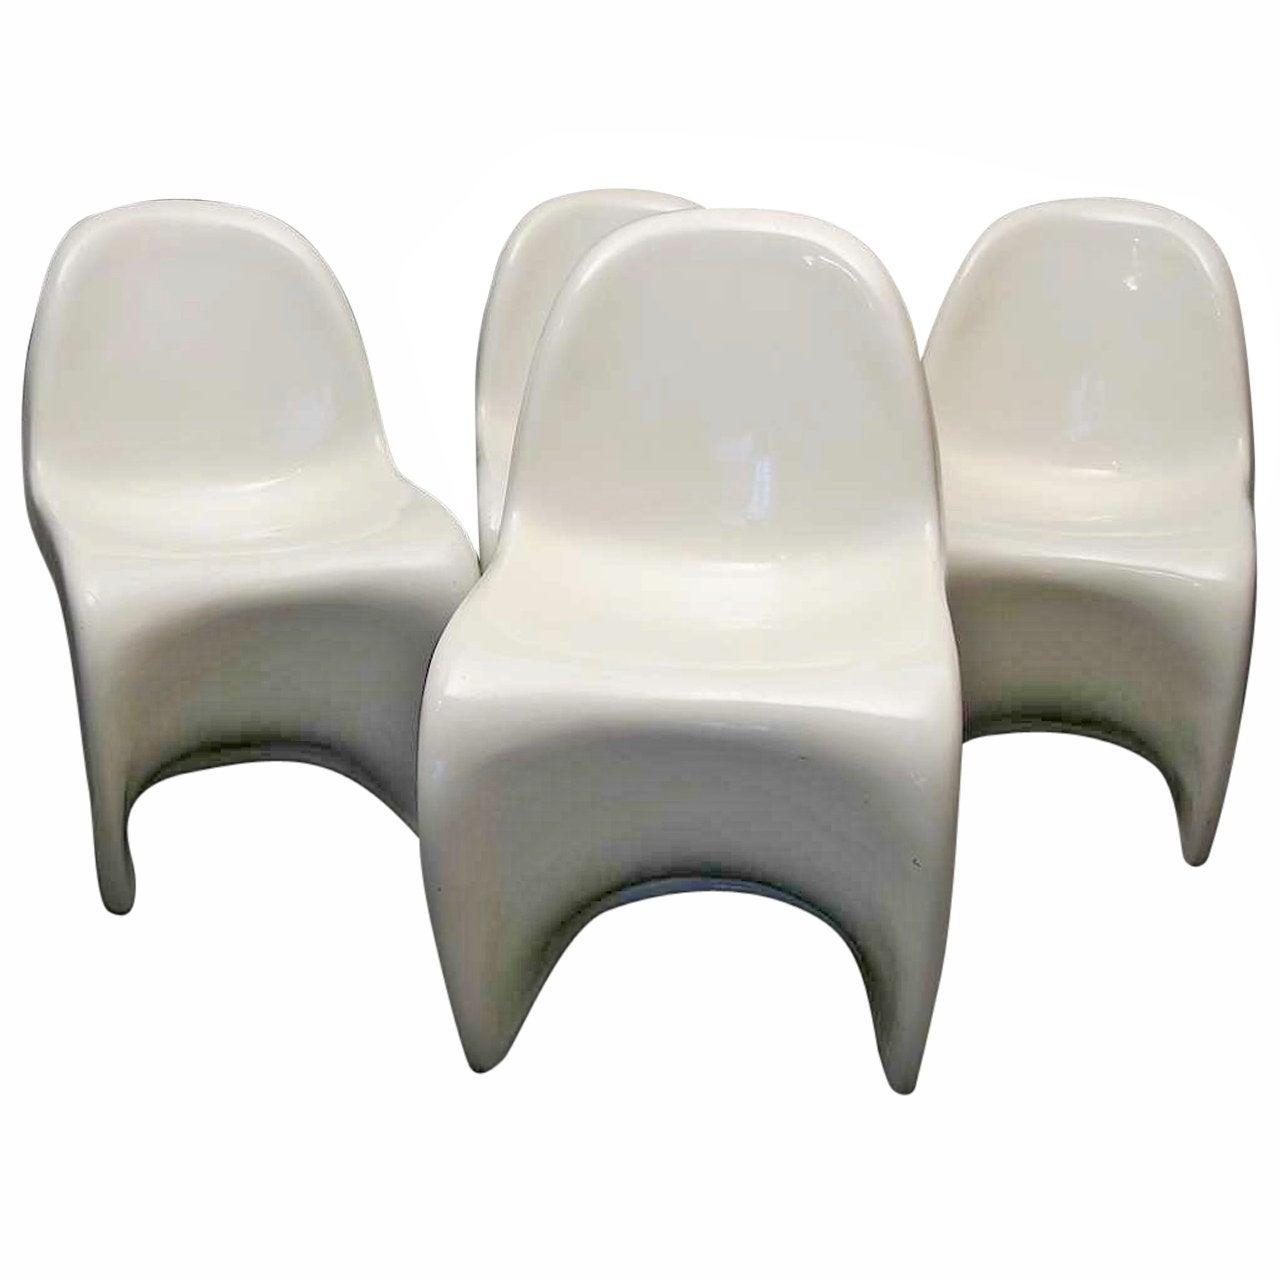 Verner Panton White Chairs, 1960